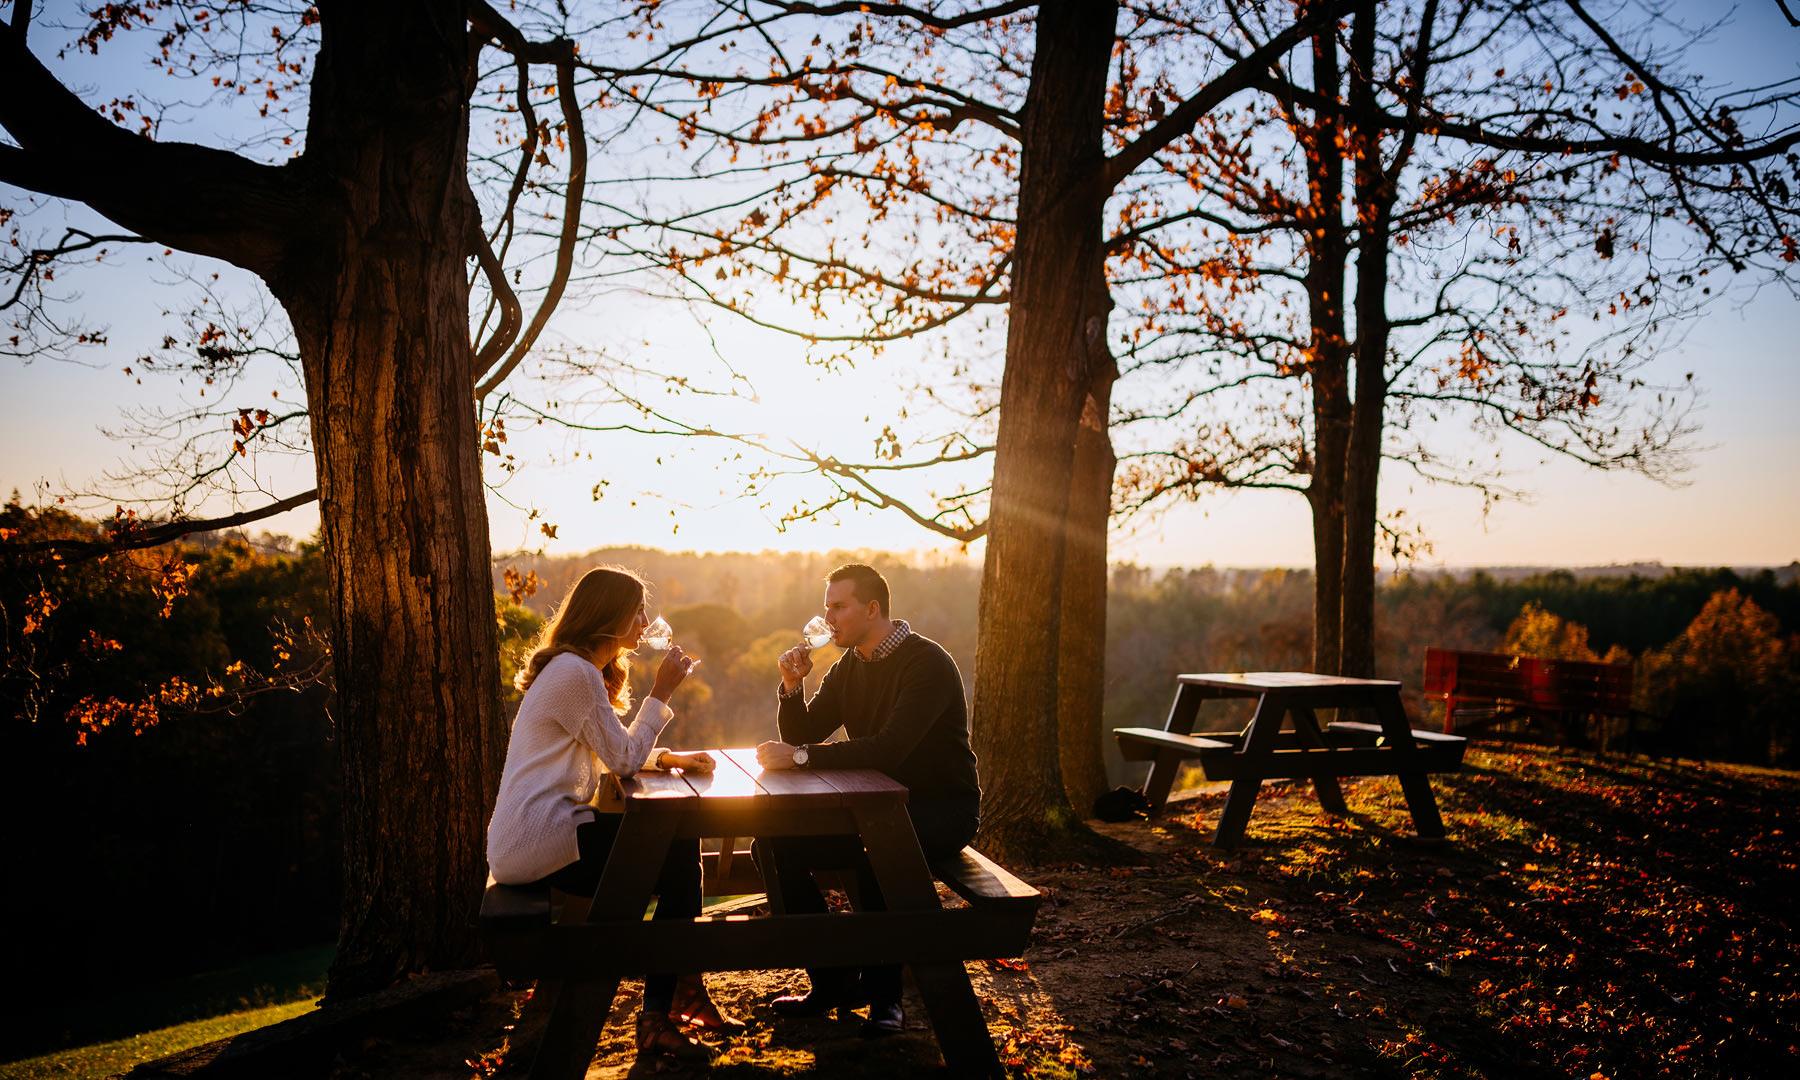 autumn engagement session with wine athens ohio charleston wv